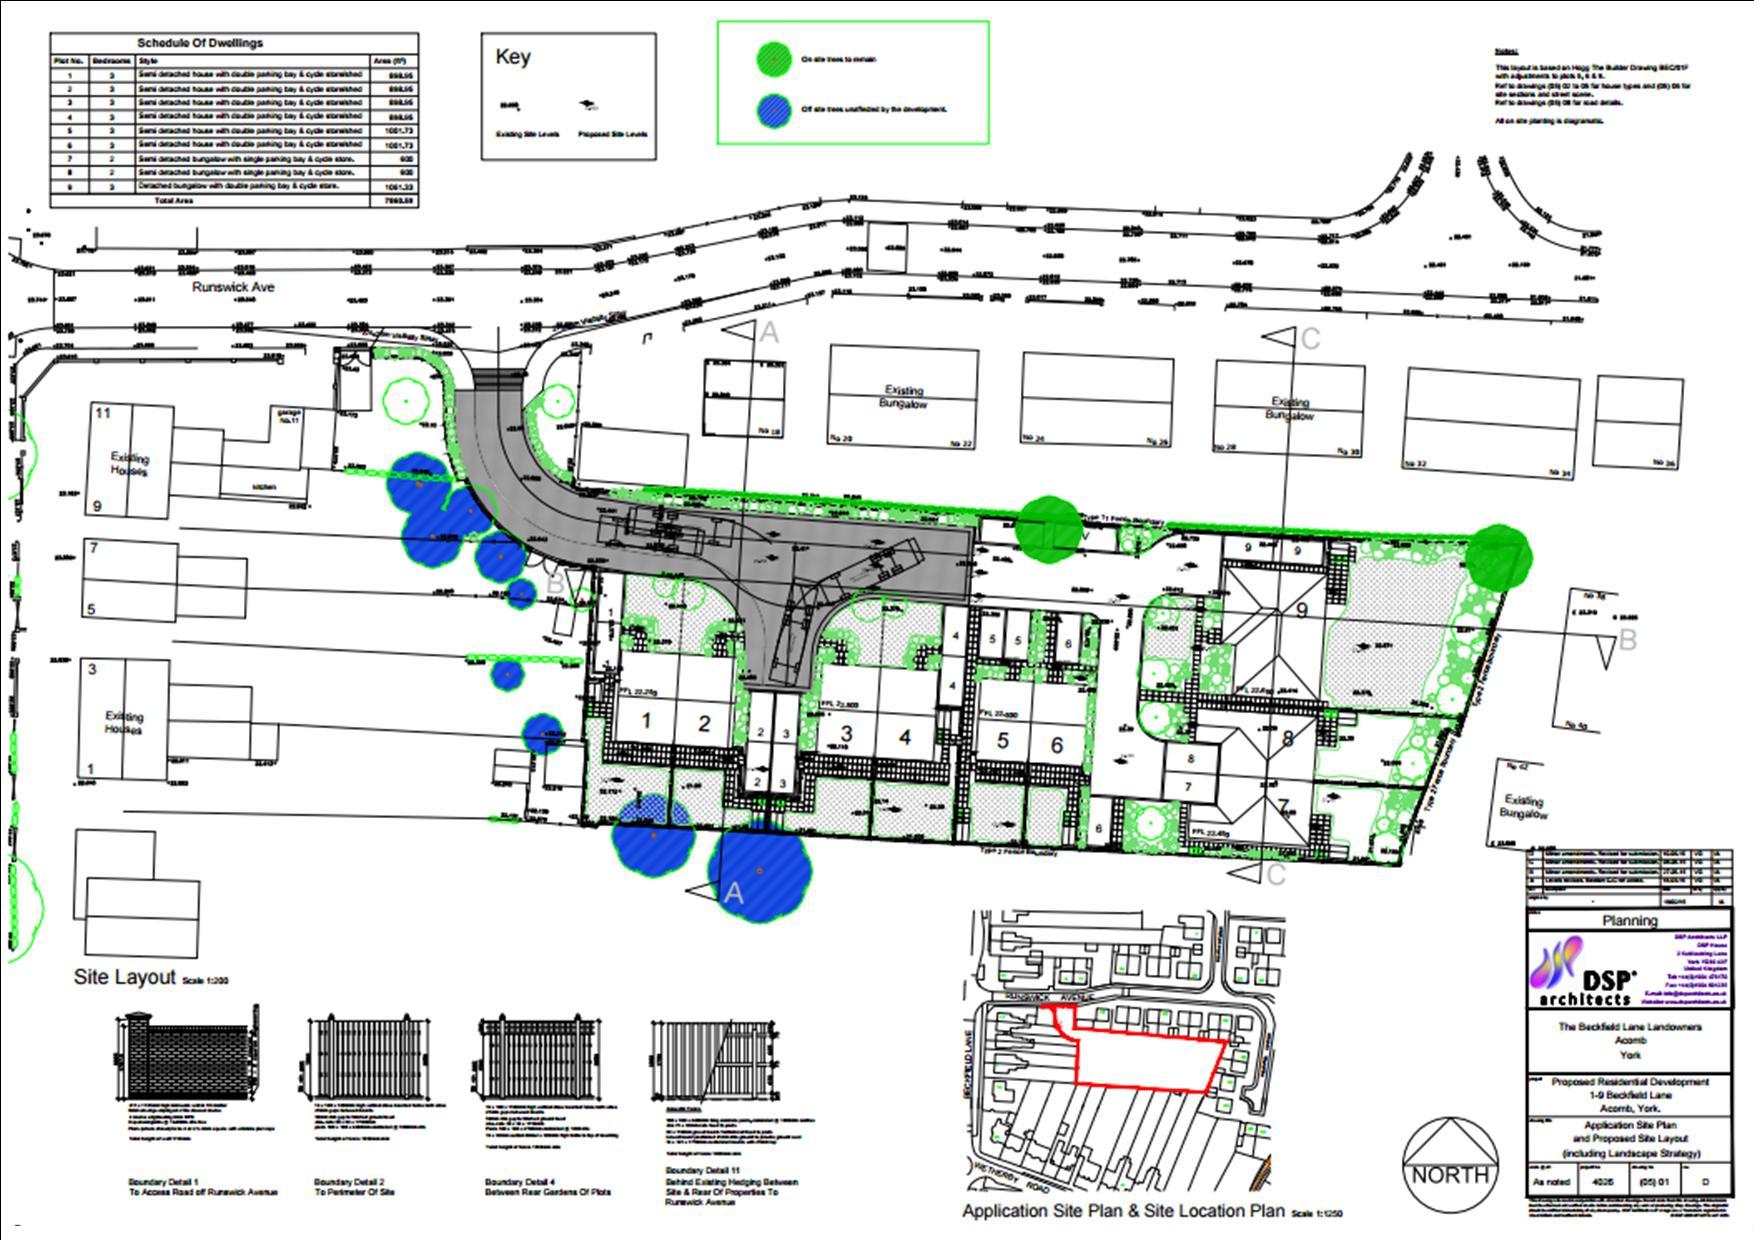 Beckfield Lane/Runswick Avenue click to access